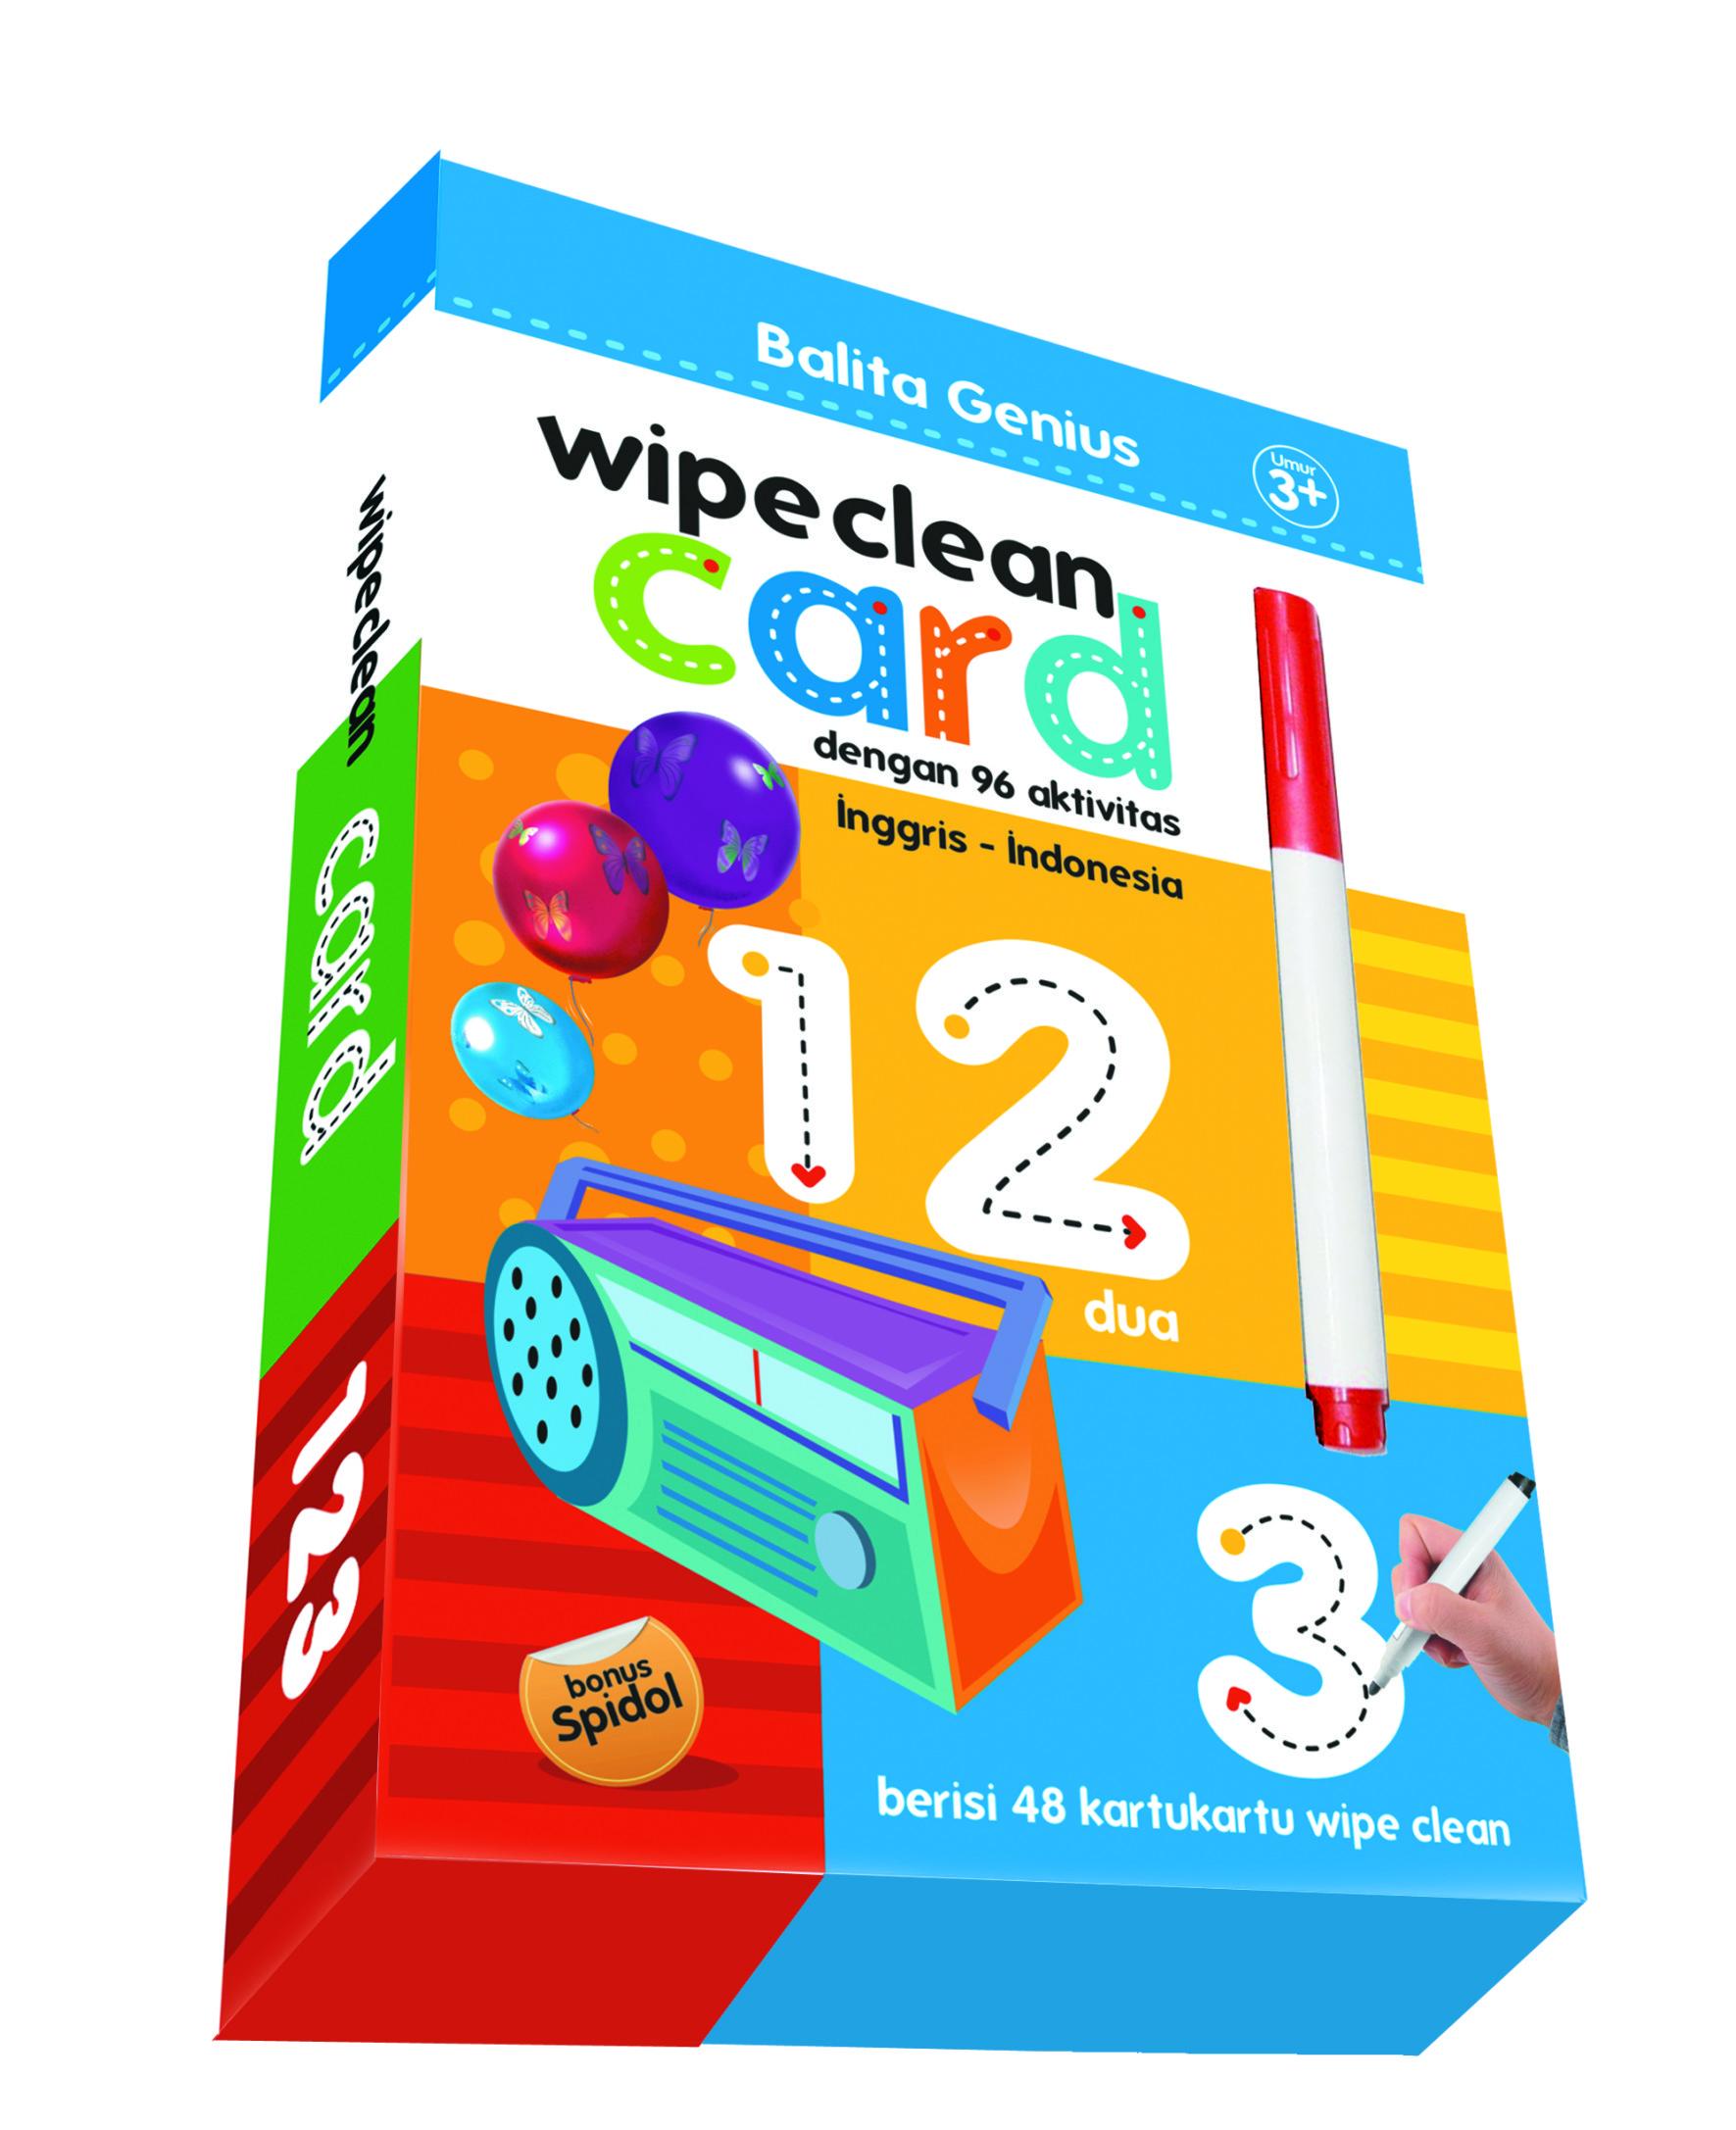 Wipe clean card : Balita genius - 123 Sita